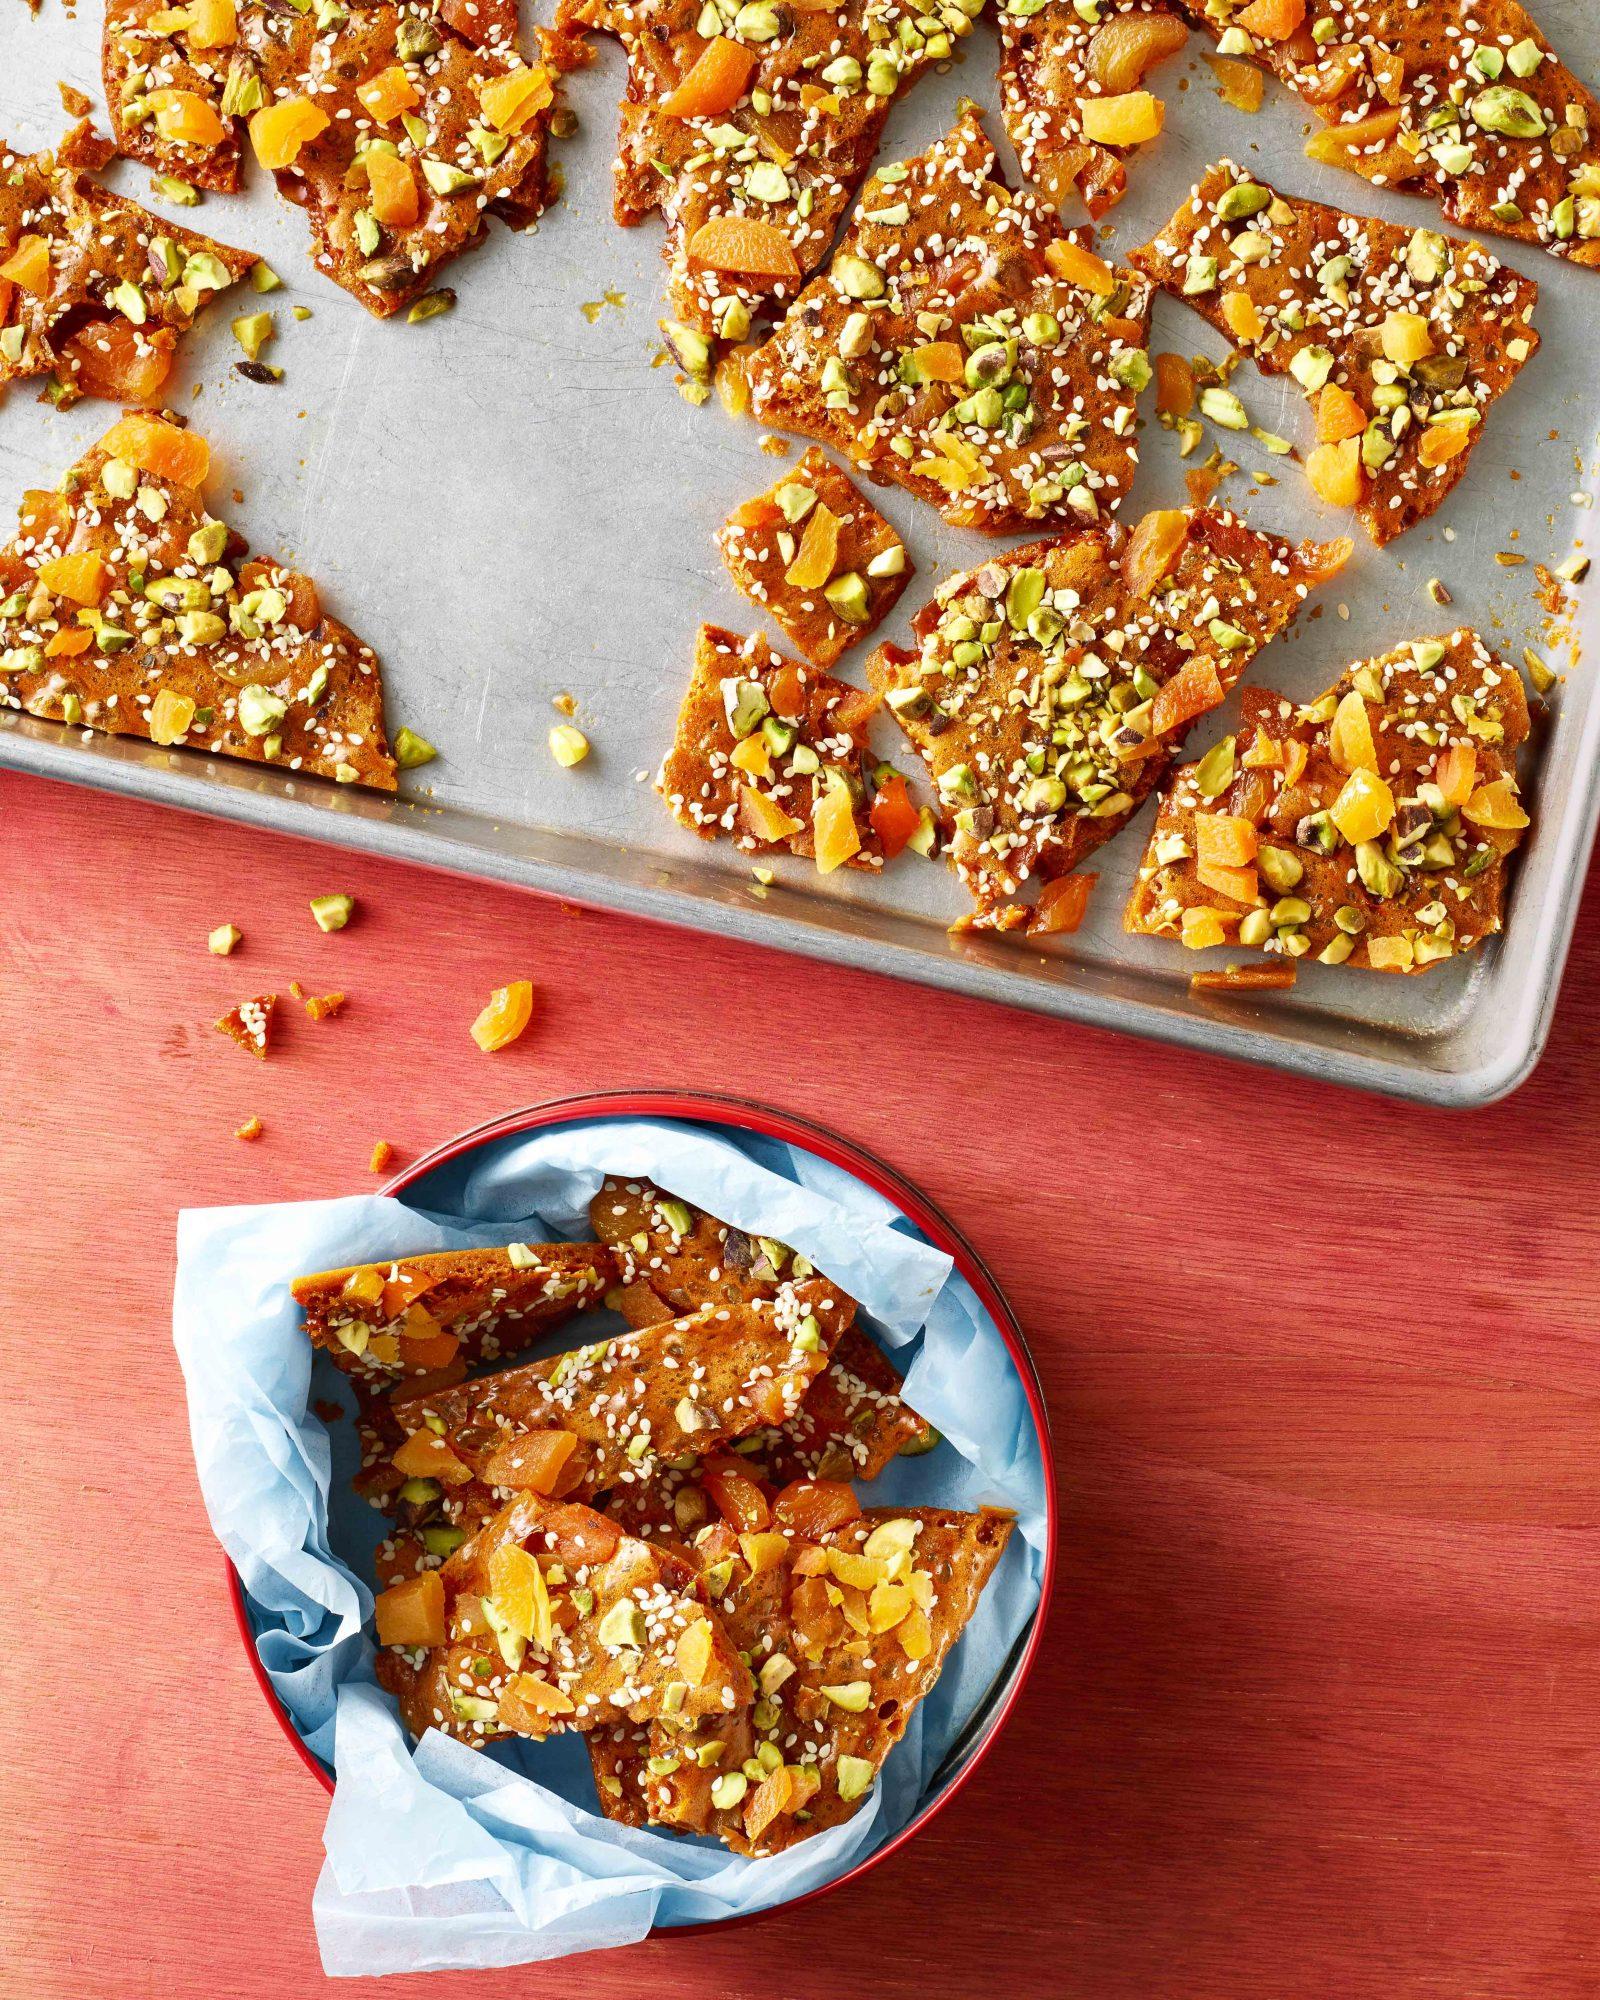 Pistachio, Apricot & Sesame Brittle